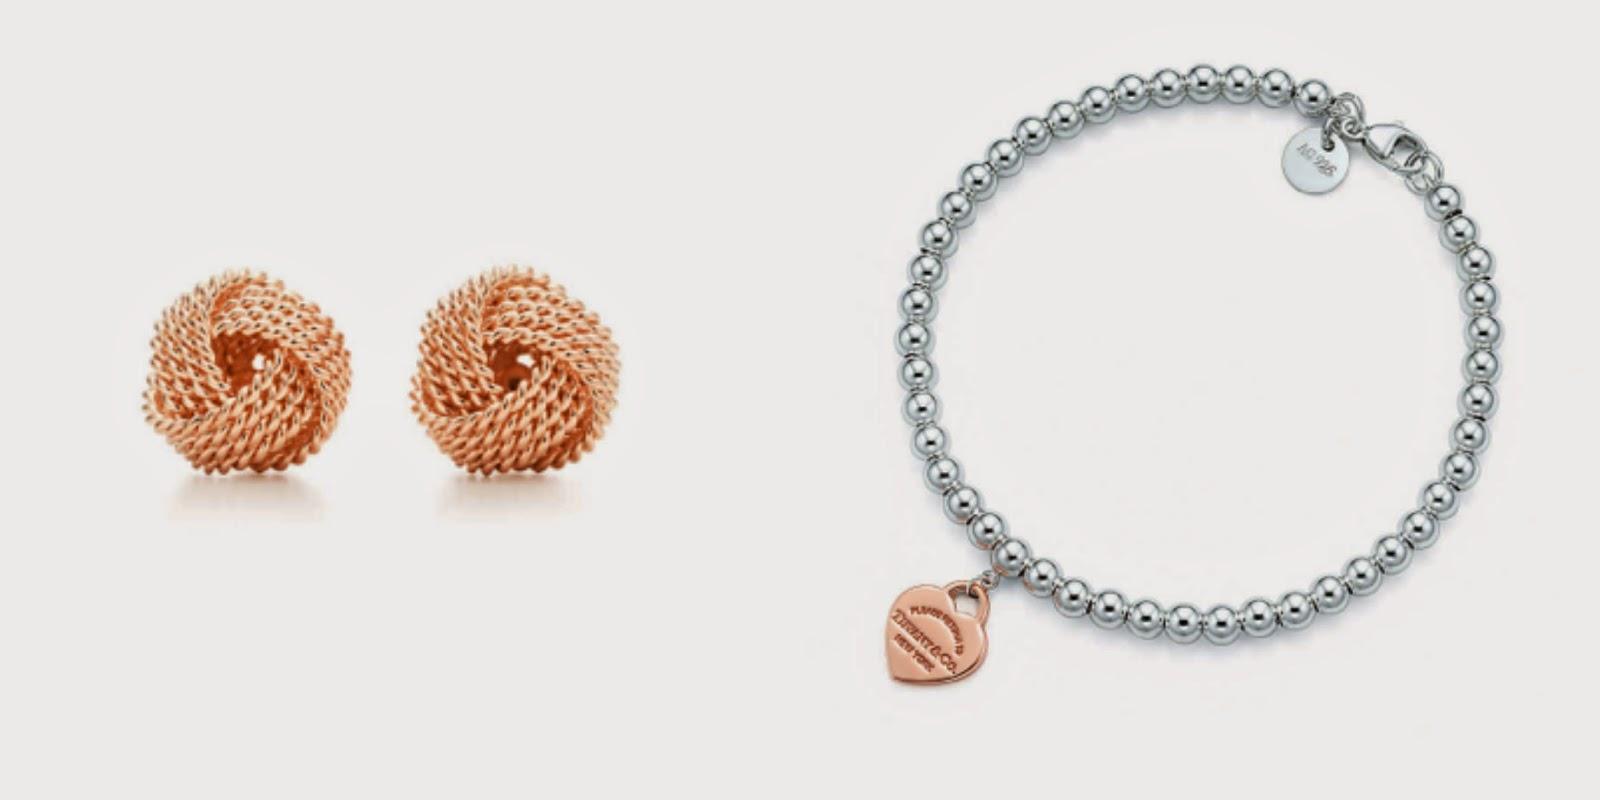 tiffany armband rosegold. Black Bedroom Furniture Sets. Home Design Ideas